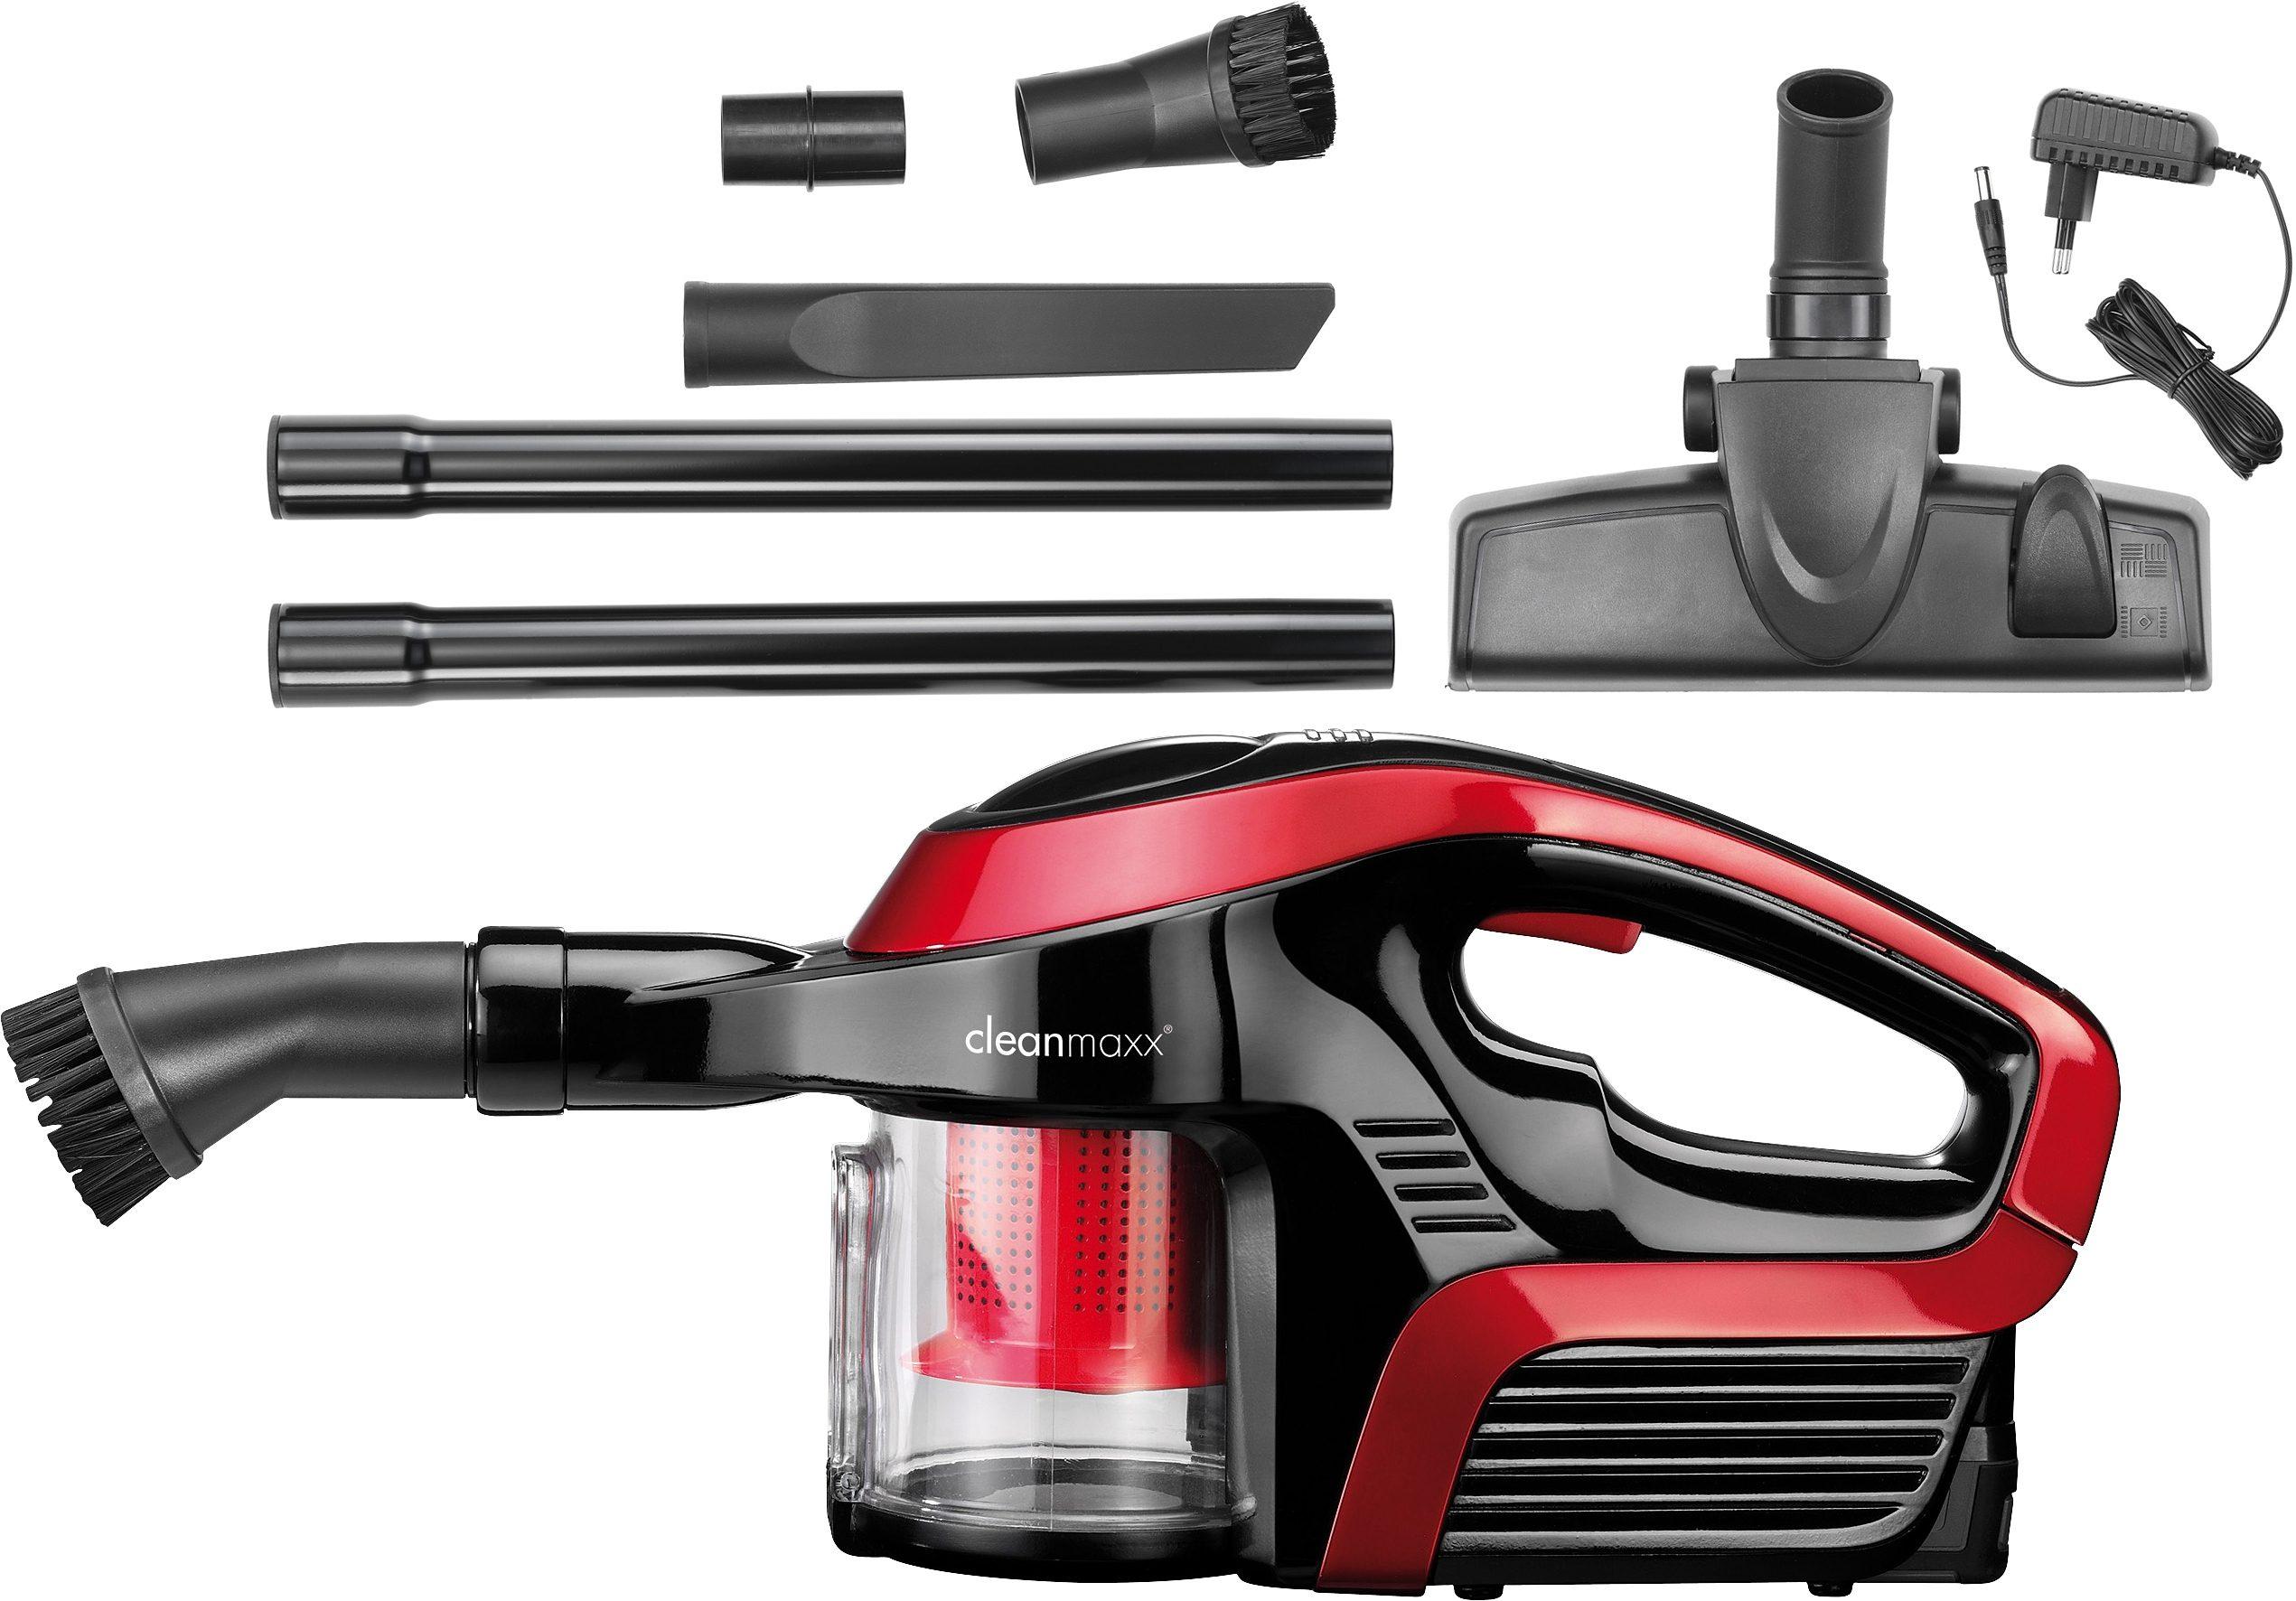 Clean Maxx Akku-Handsauger Sensation, 120 Watt, beutellos, mit Zyklon-Technologie